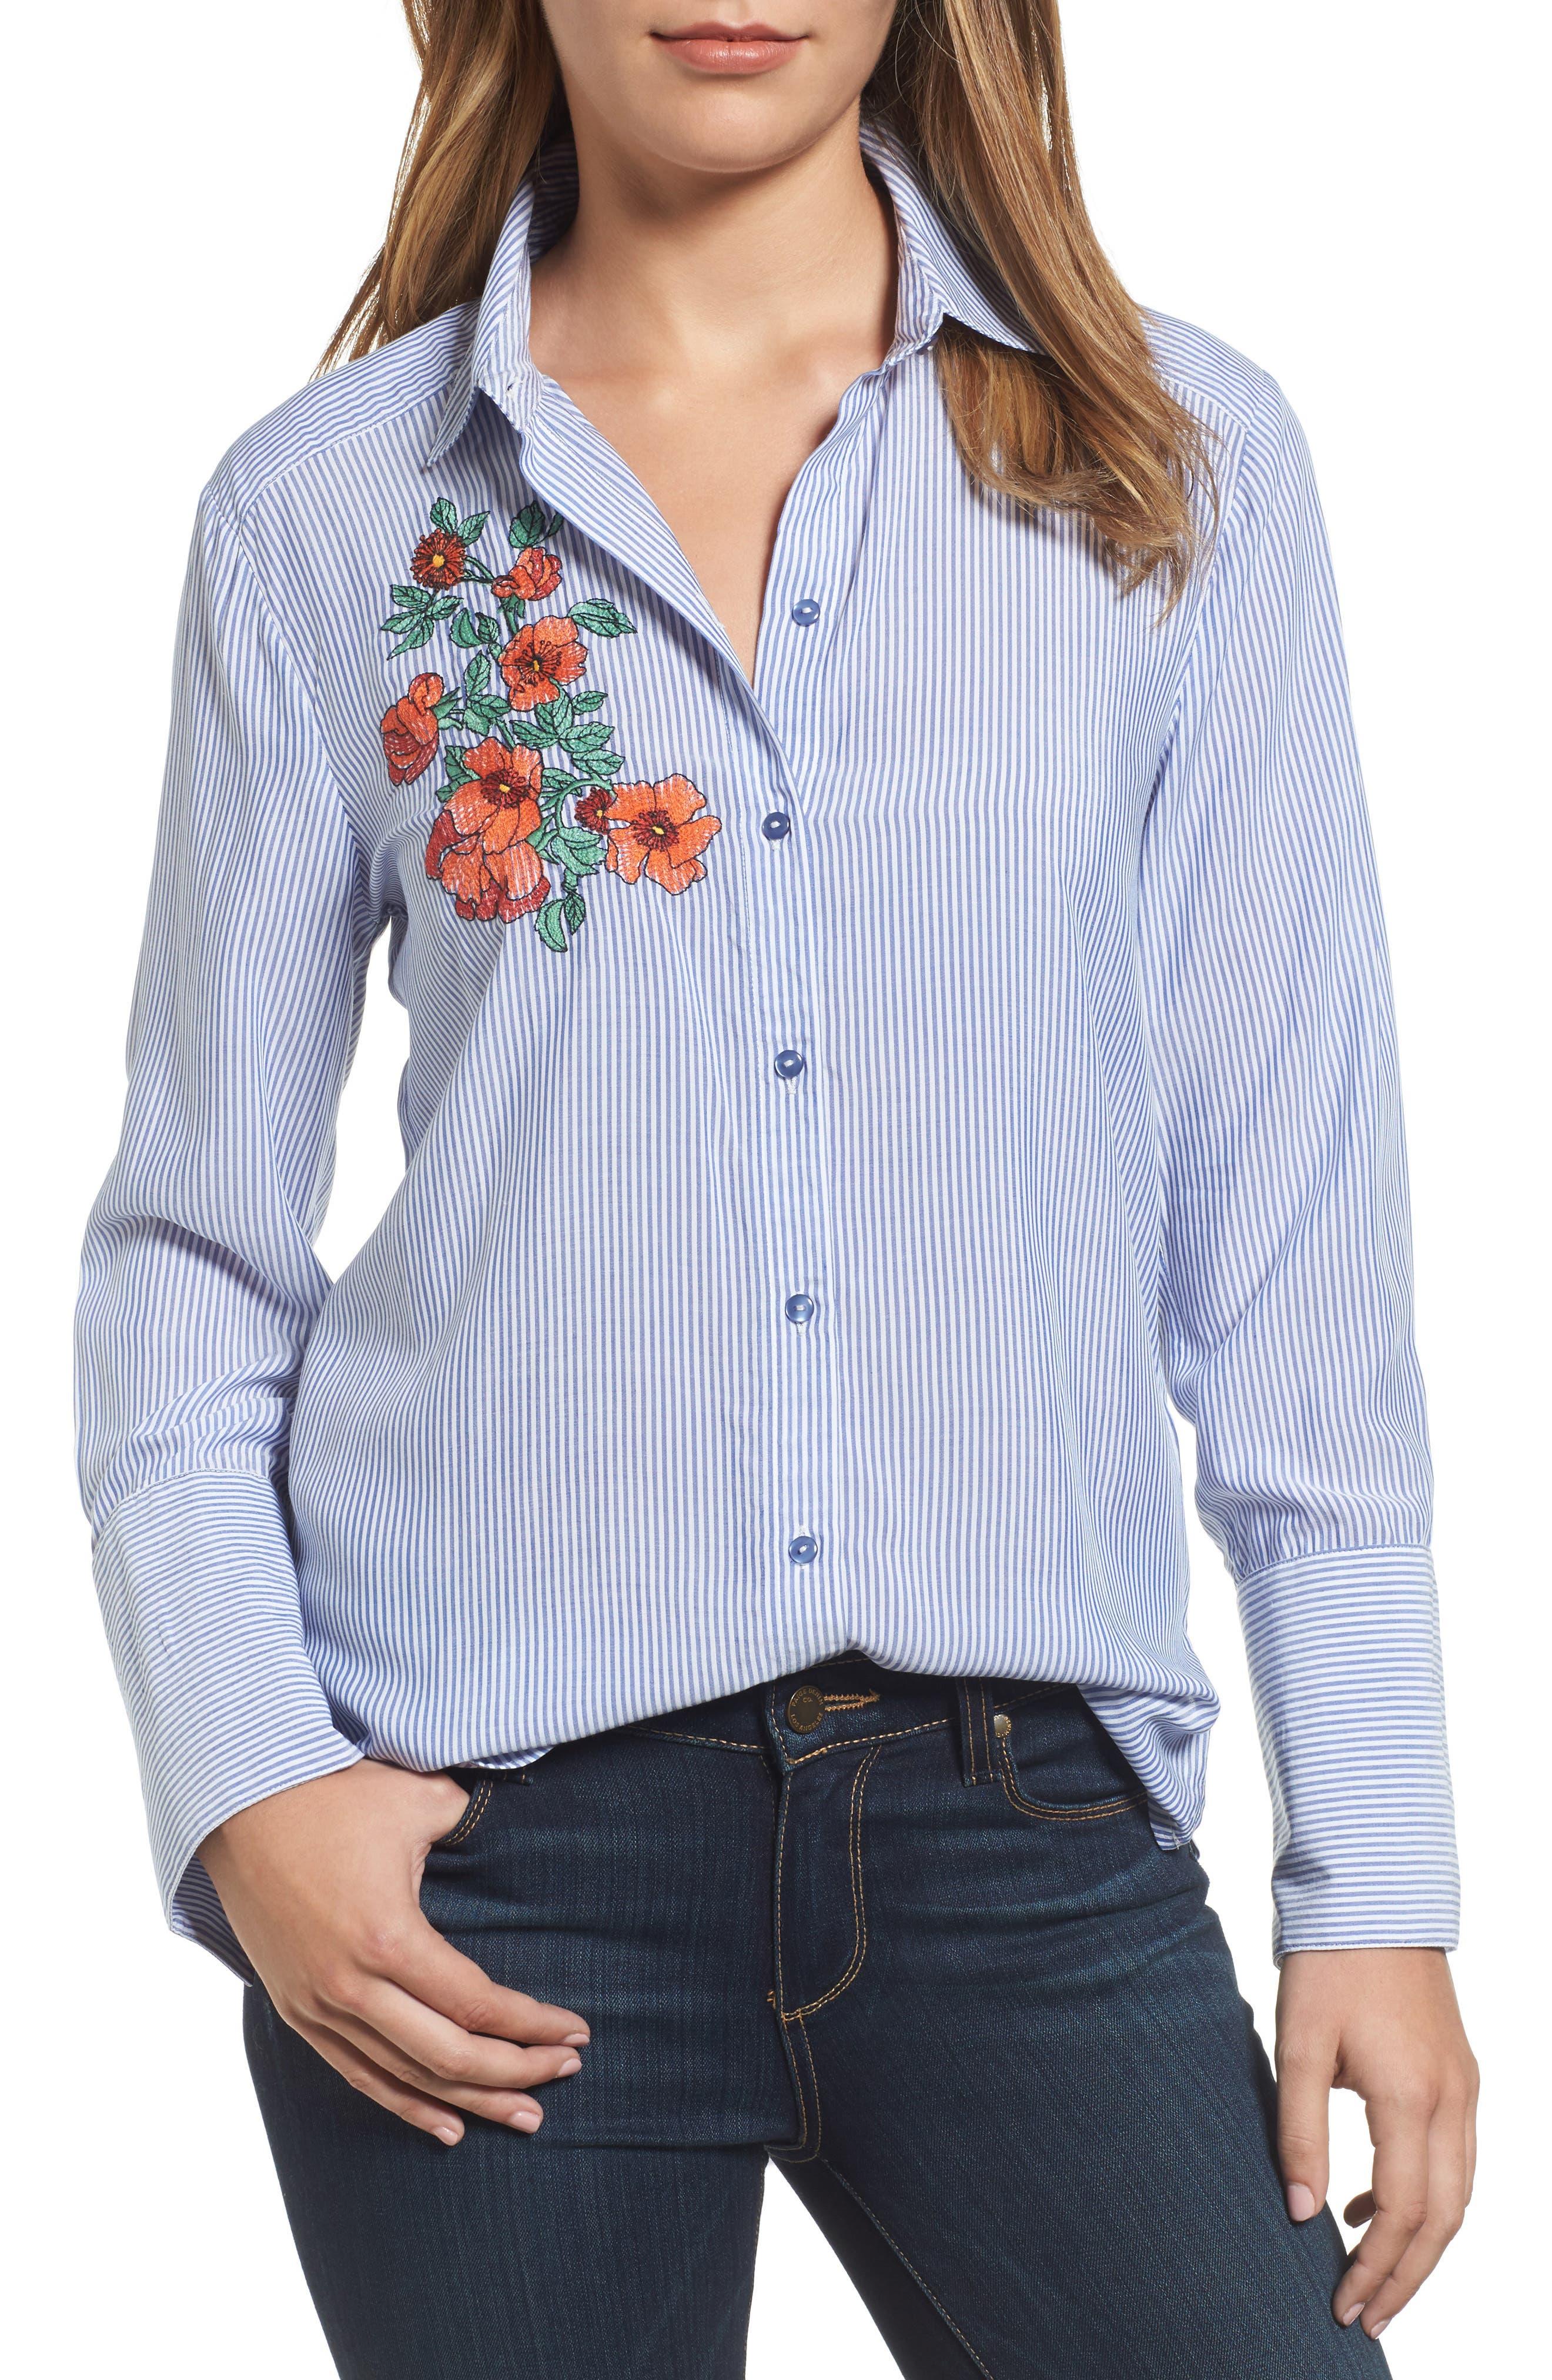 Wide Cuff Embroidered Button Down,                         Main,                         color, Blue/ White